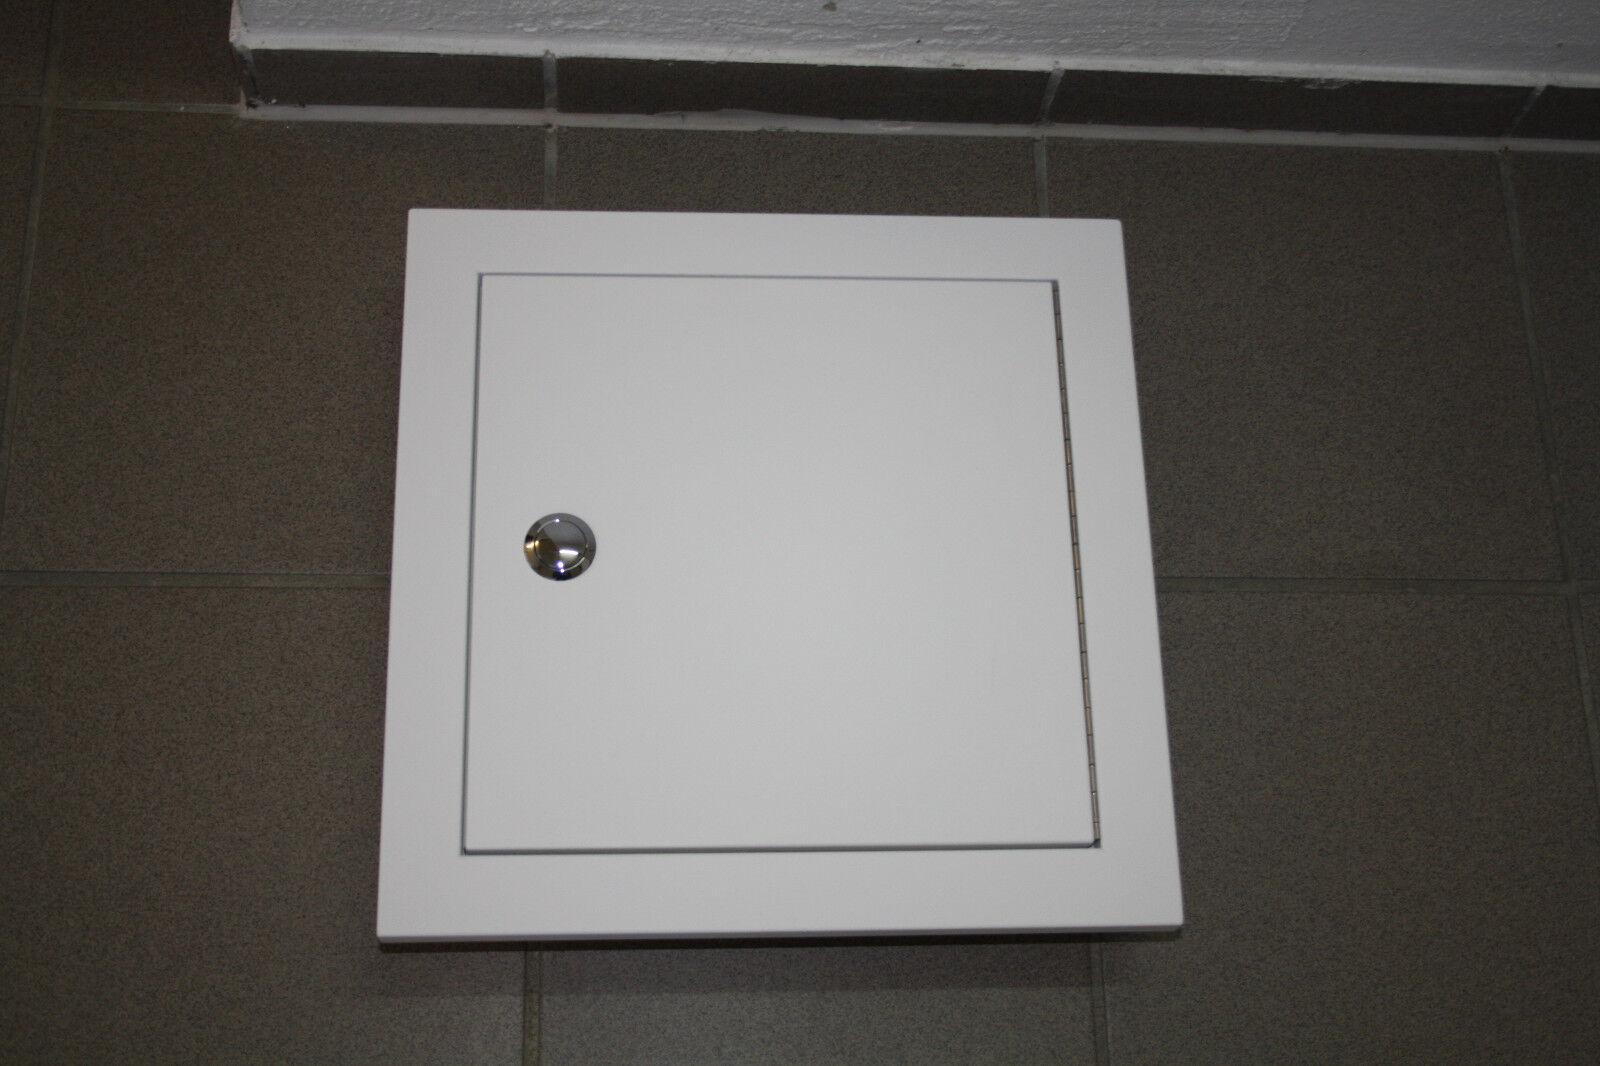 Wäscheschacht , Schachttür 300 mit versenkbarem Drehknopf